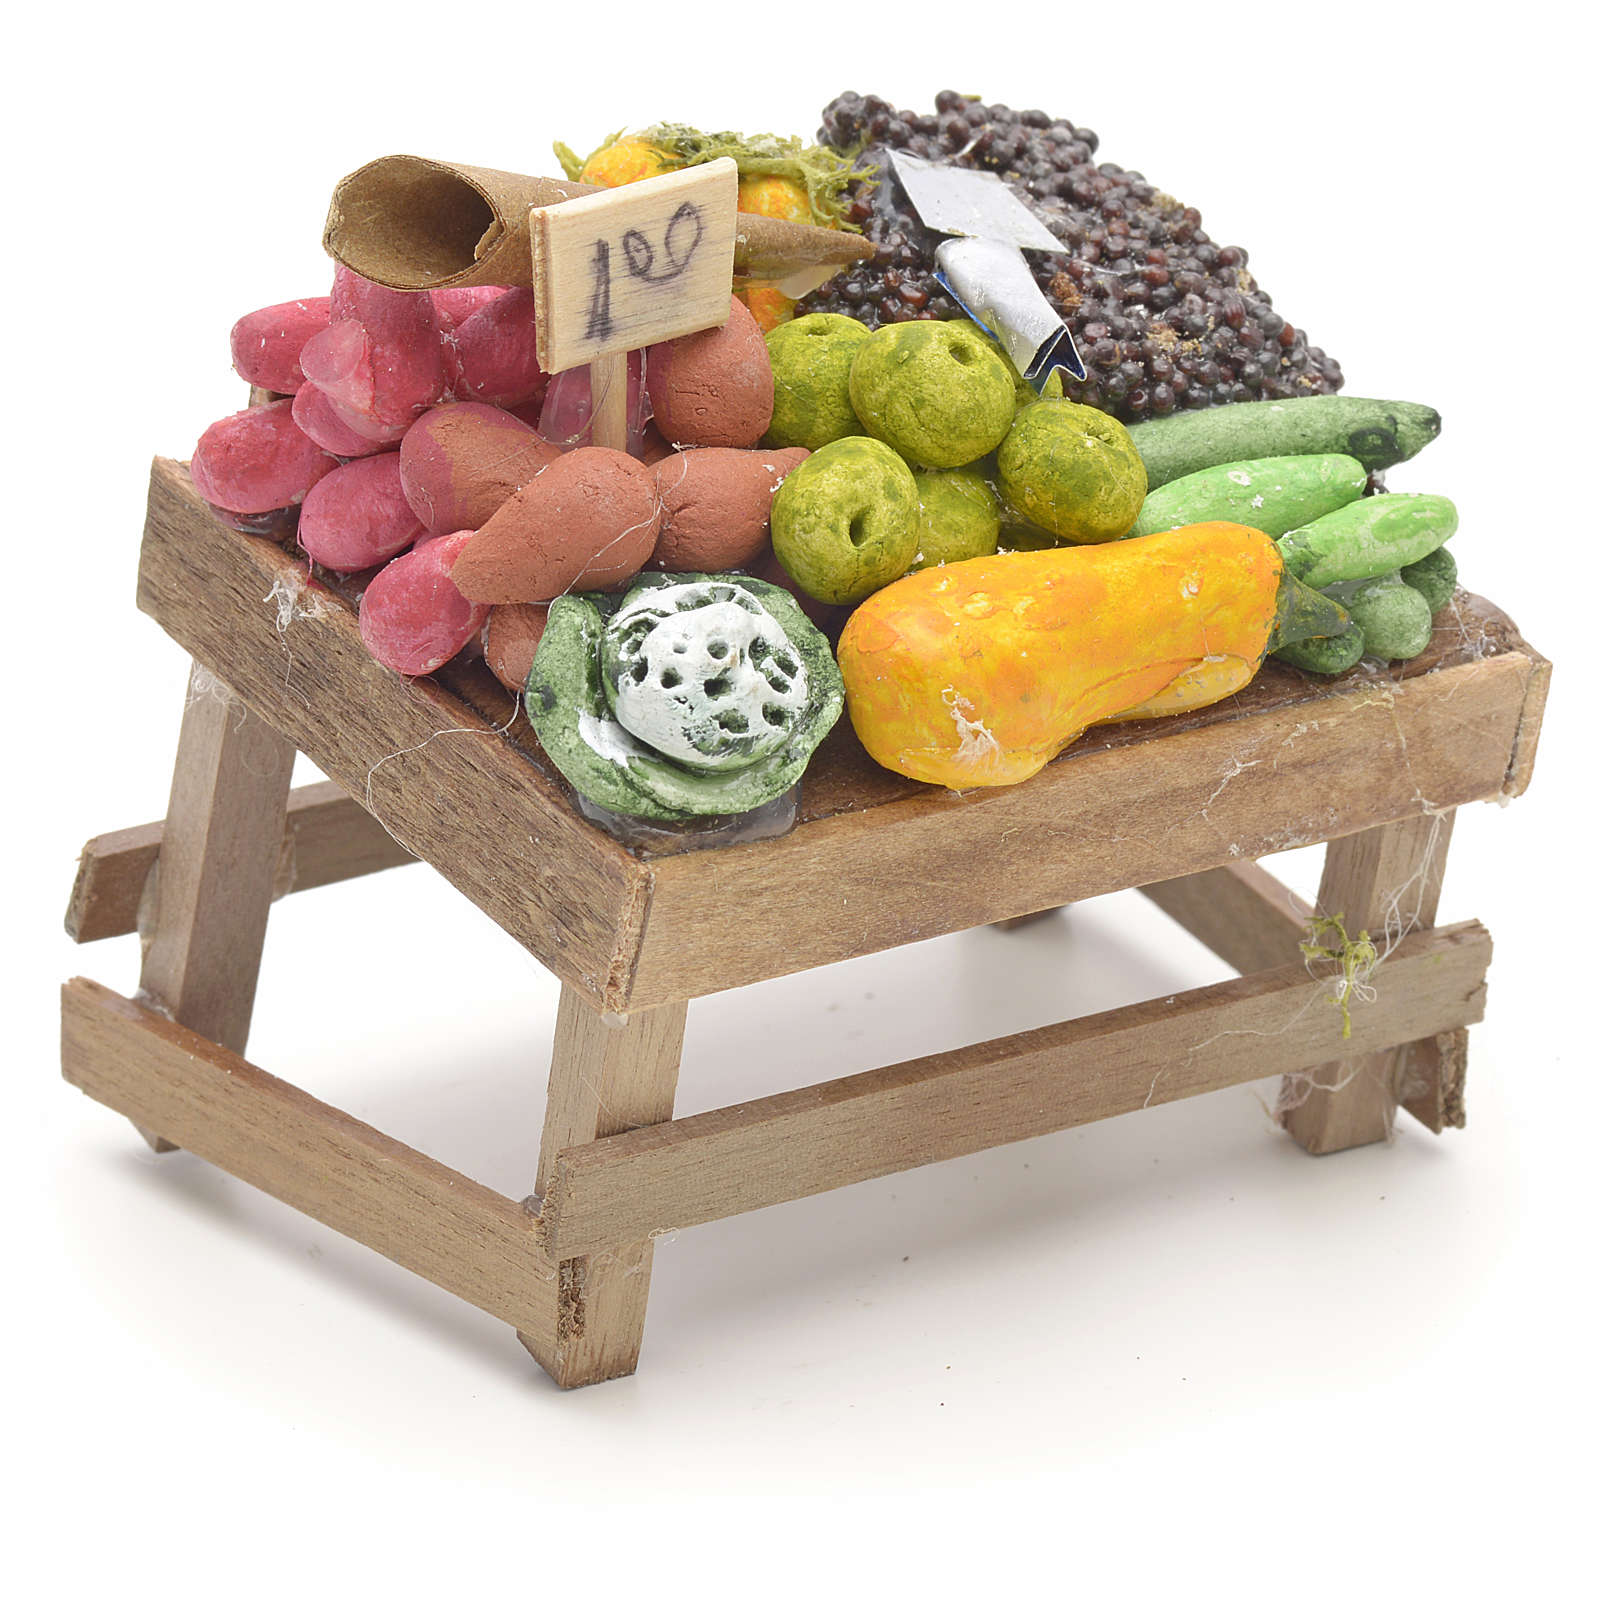 Banco de la fruta pesebre napolitano 4